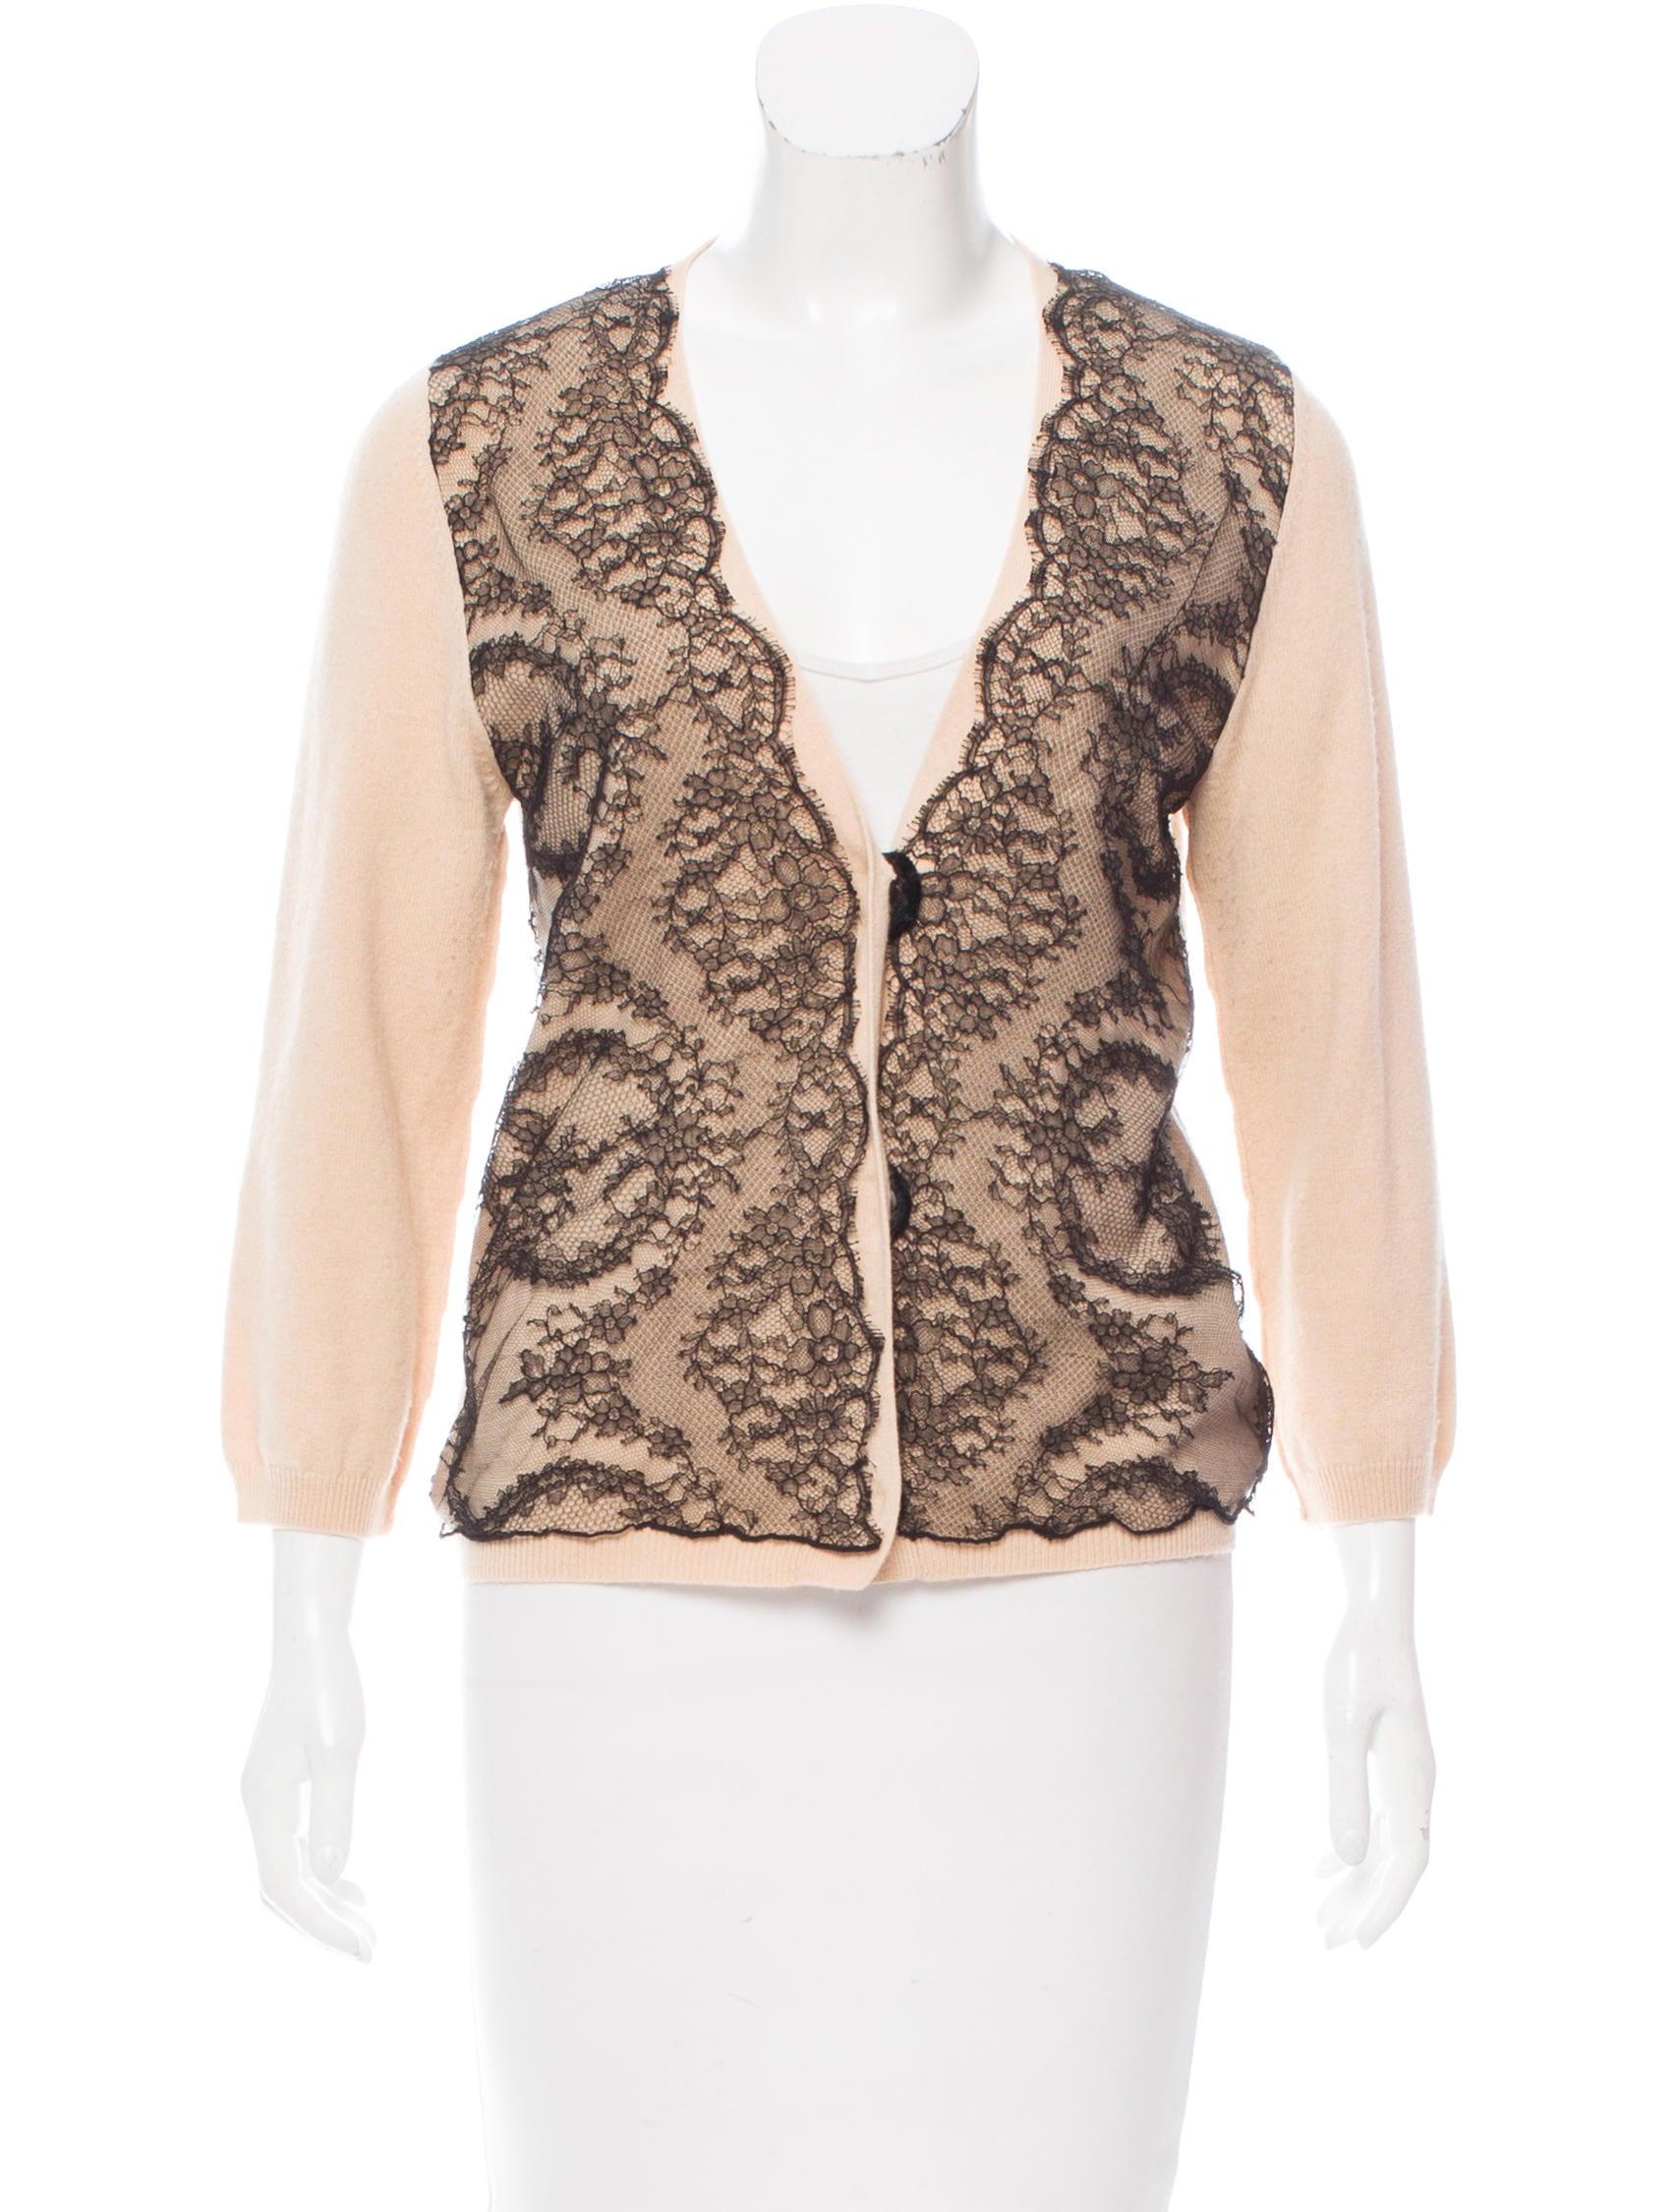 Zhor & Nema Wool And Cashmere-Blend Cardigan - Clothing ...